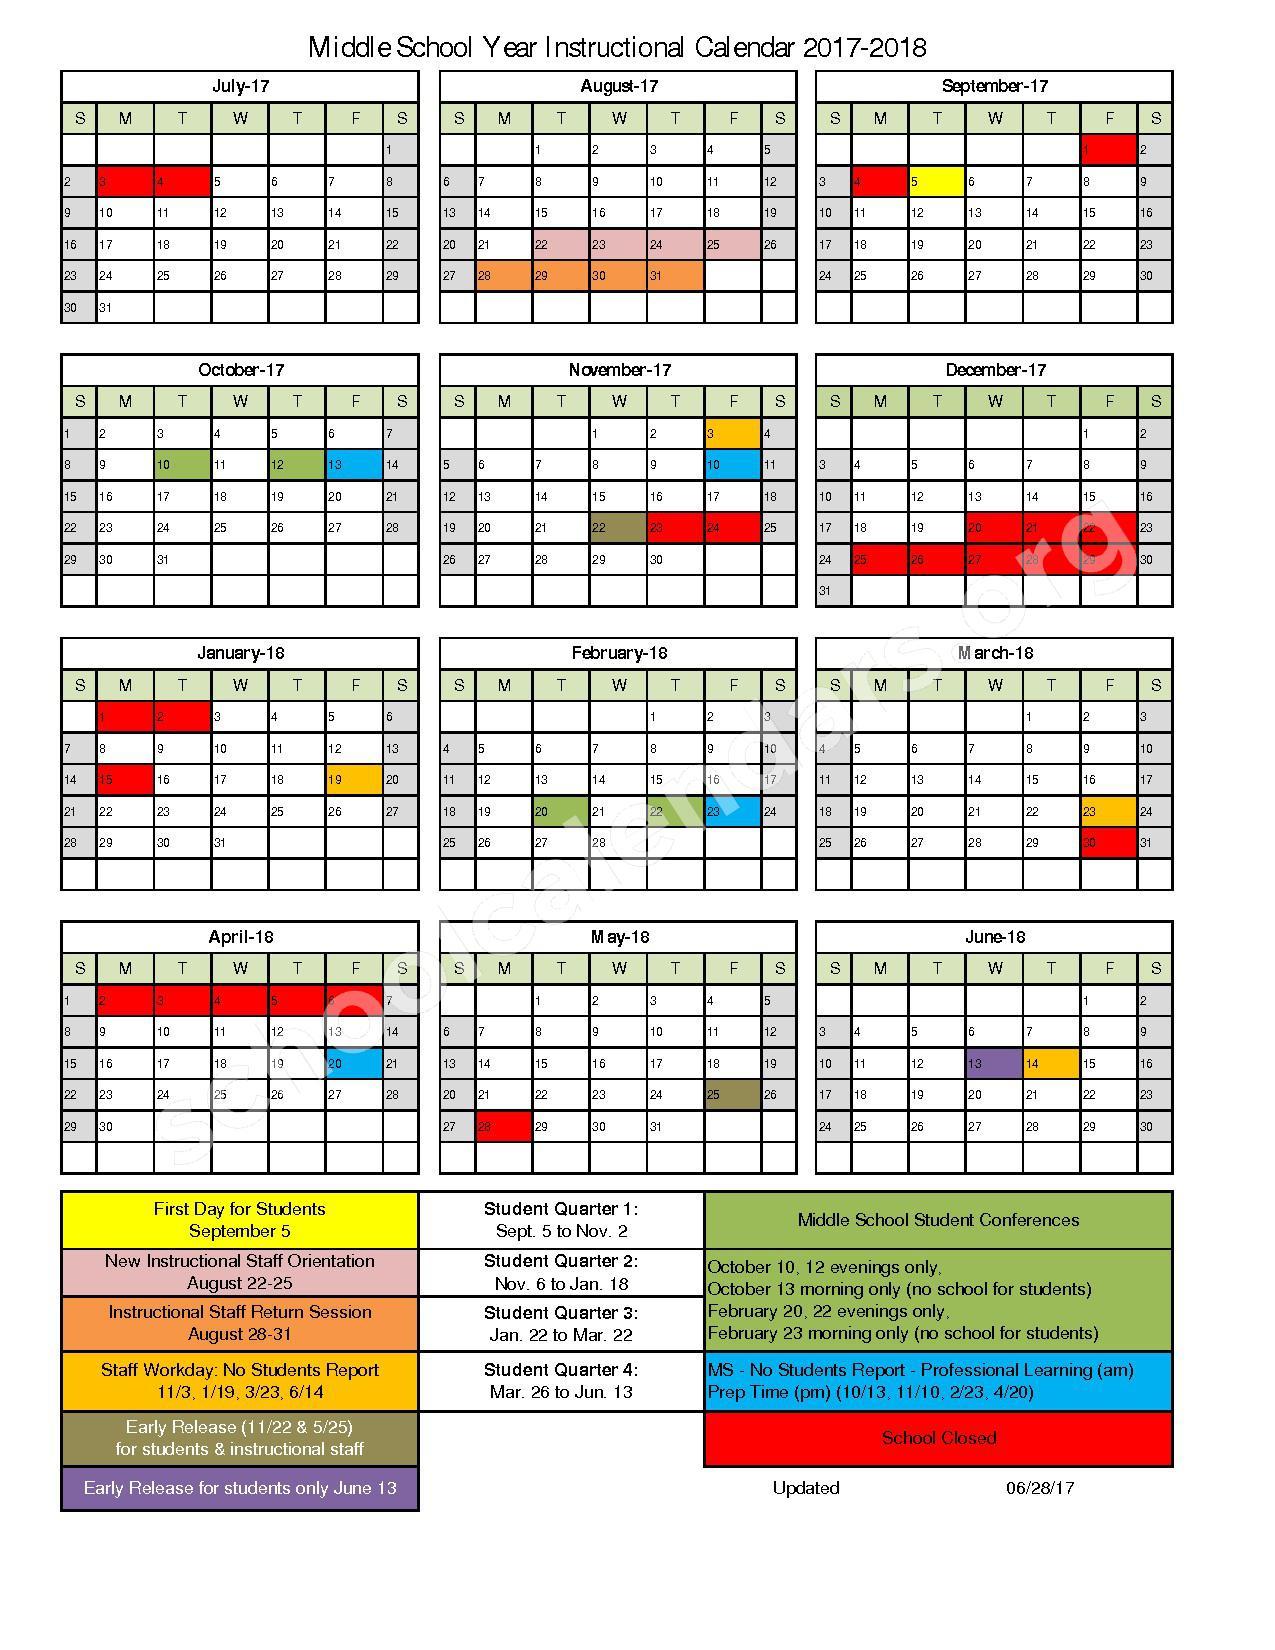 2017 - 2018 Middle School Instructional Calendar – Kenosha School District – page 1